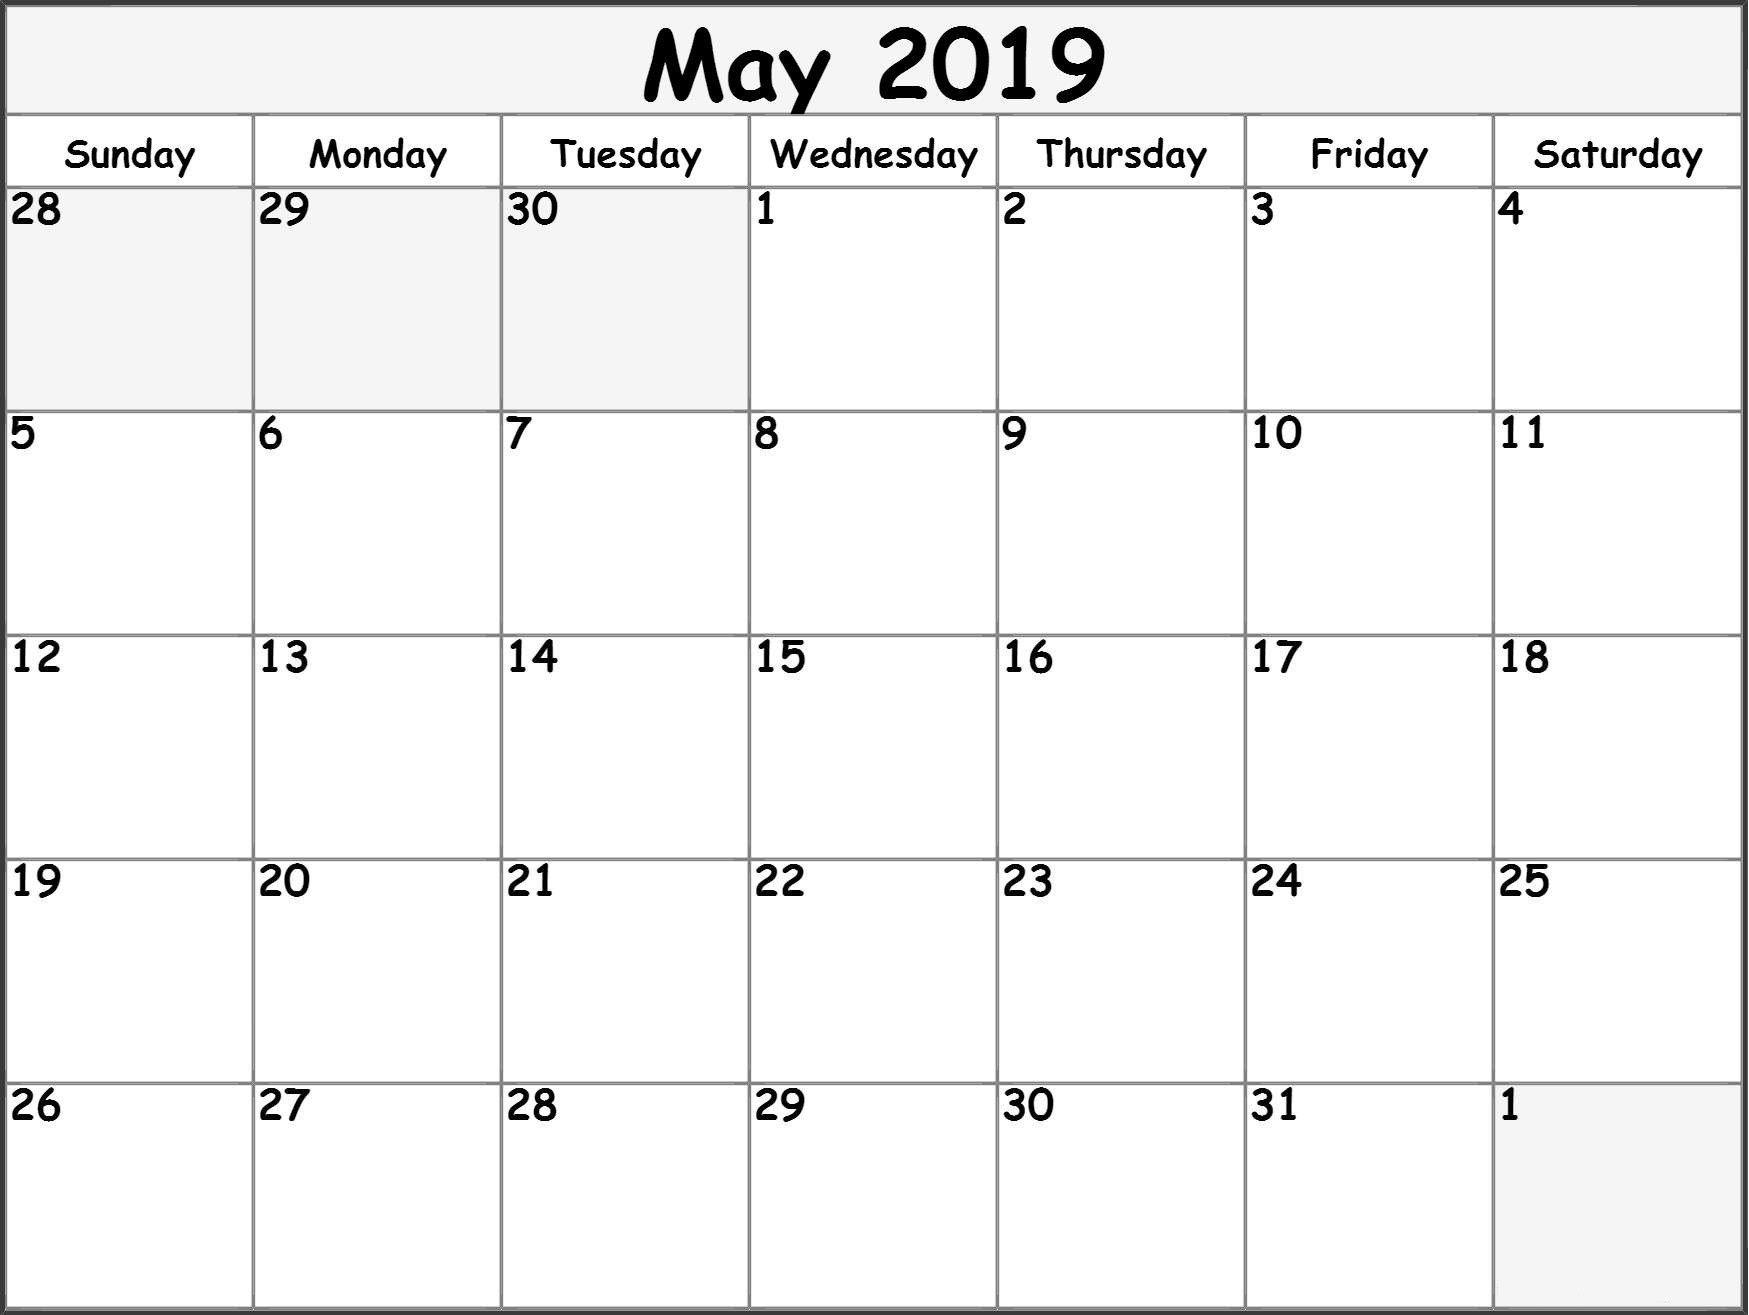 May 2019 Calendar Pdf - Printable Calendar 2019